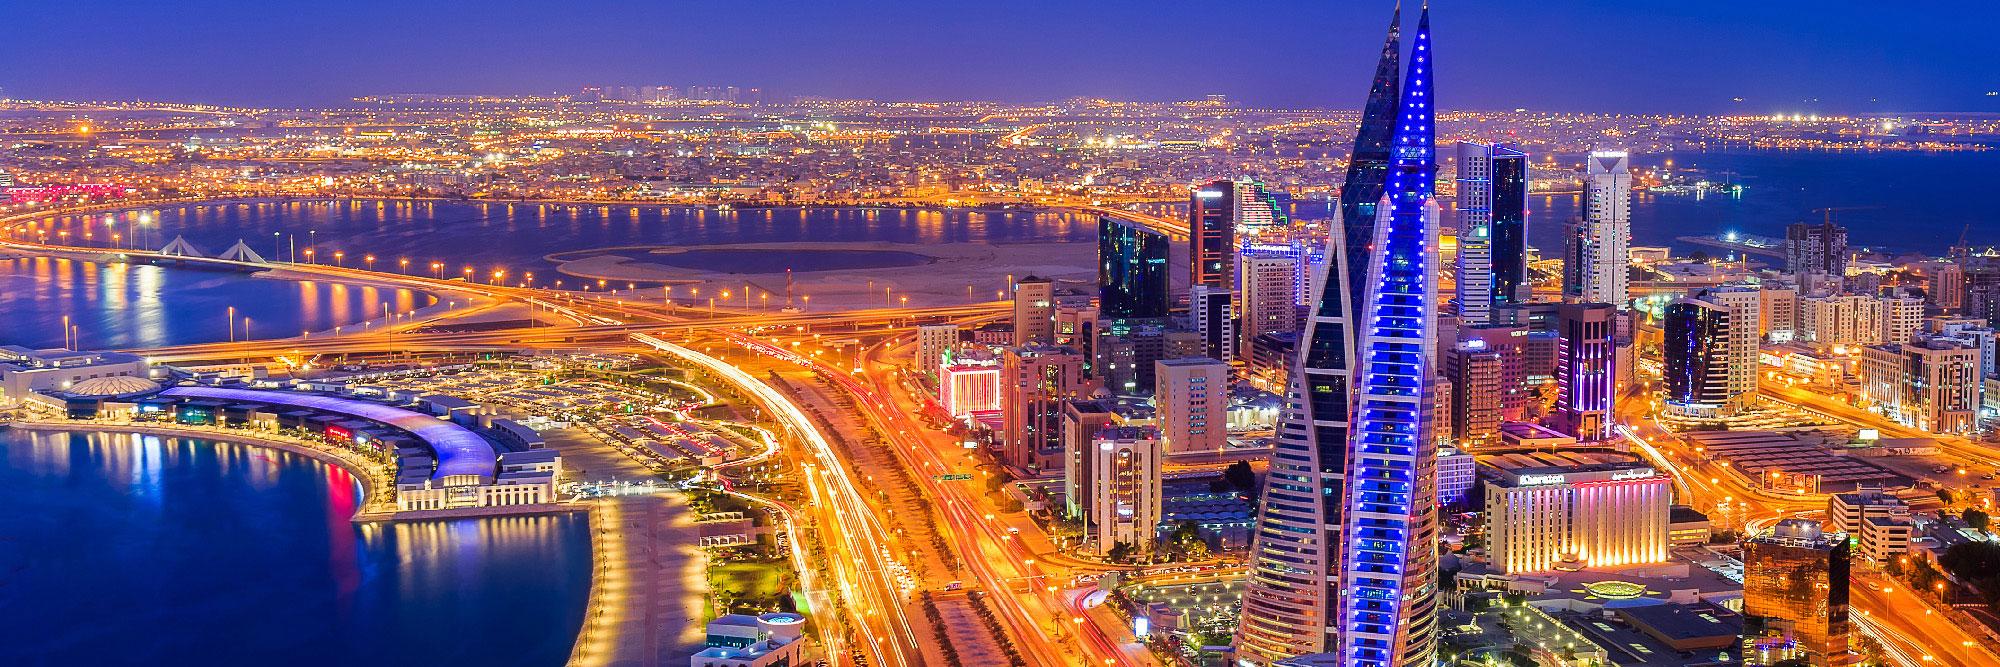 Scenic IRONMAN 70.3 Bahrain